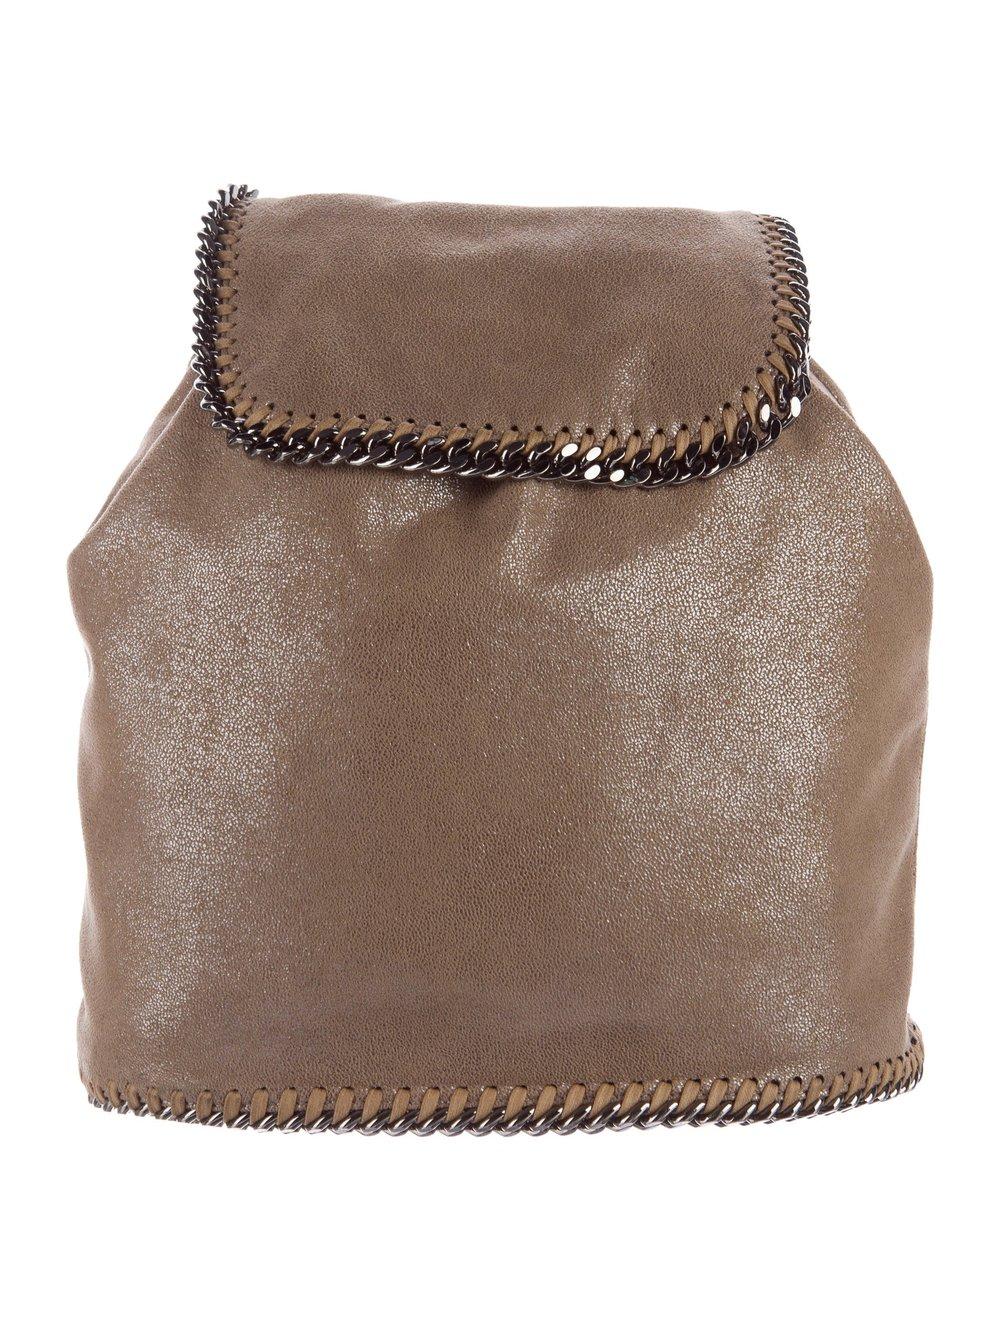 STELLA MCCARTNEY     Falabella Shaggy Deer Backpack, $472.50, therealreal.com